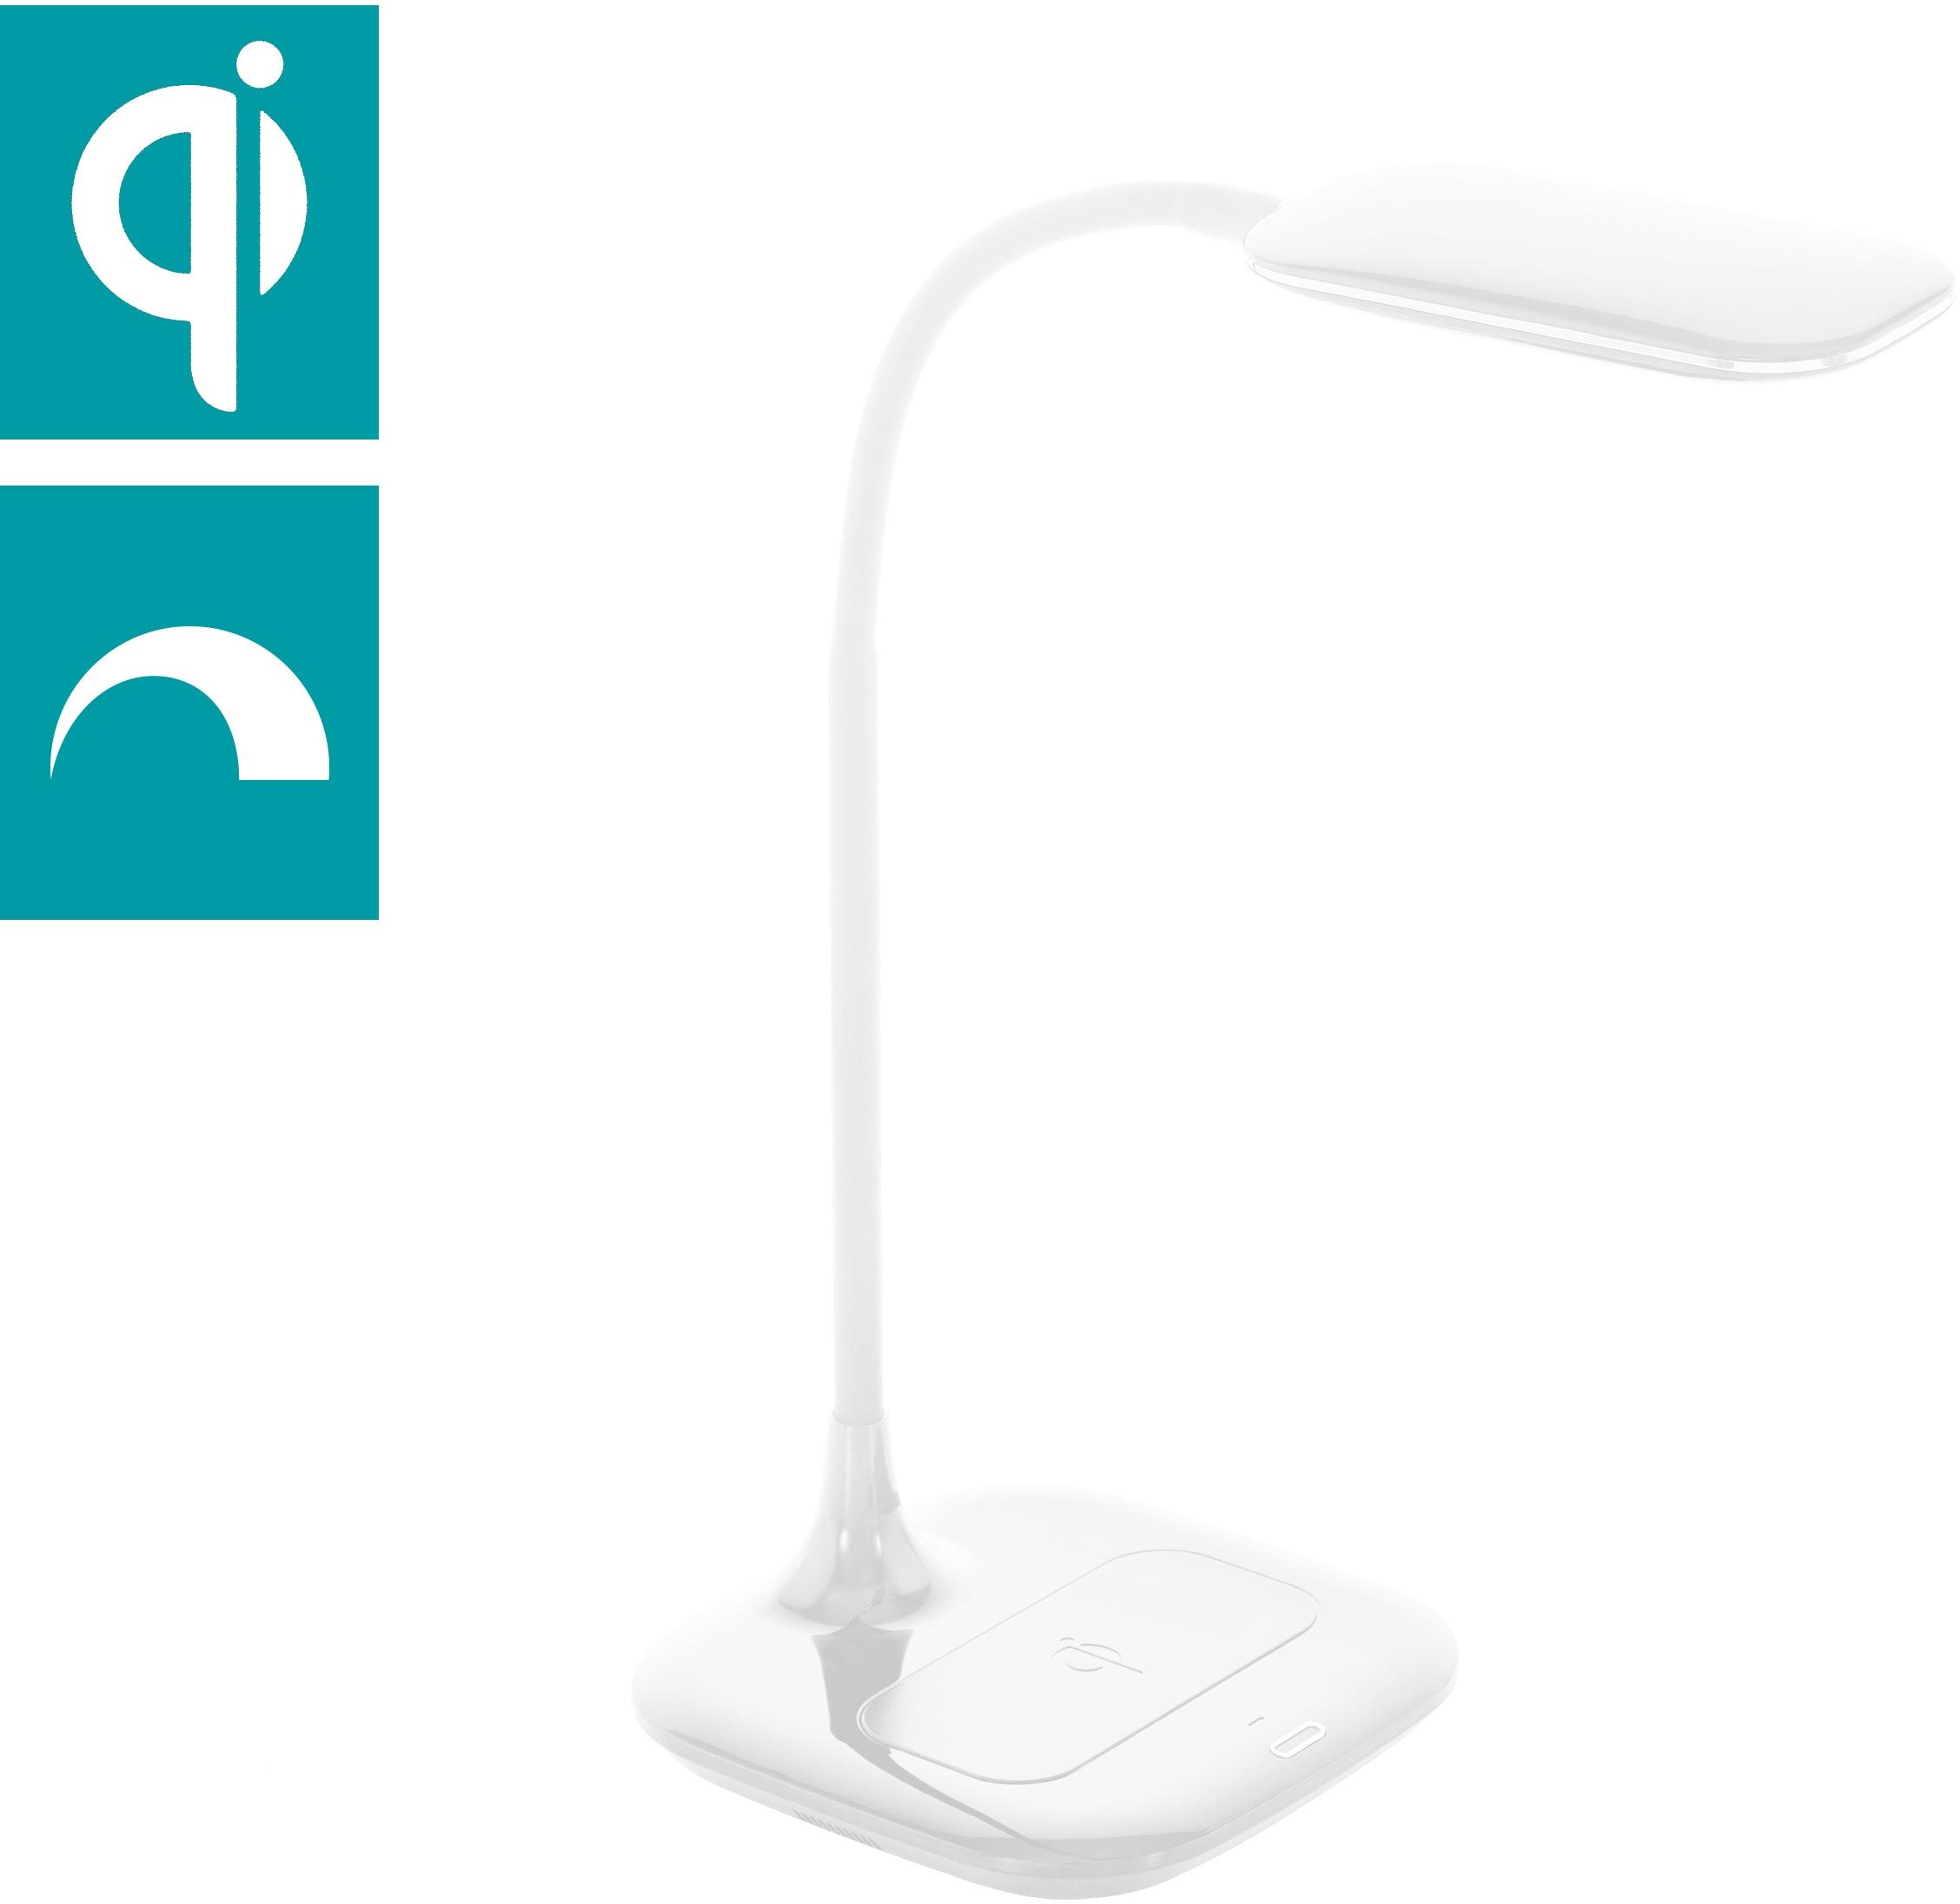 EGLO Tischleuchte MASSERIE, LED-Board, Neutralweiß, 3-step dimming, QI-charger